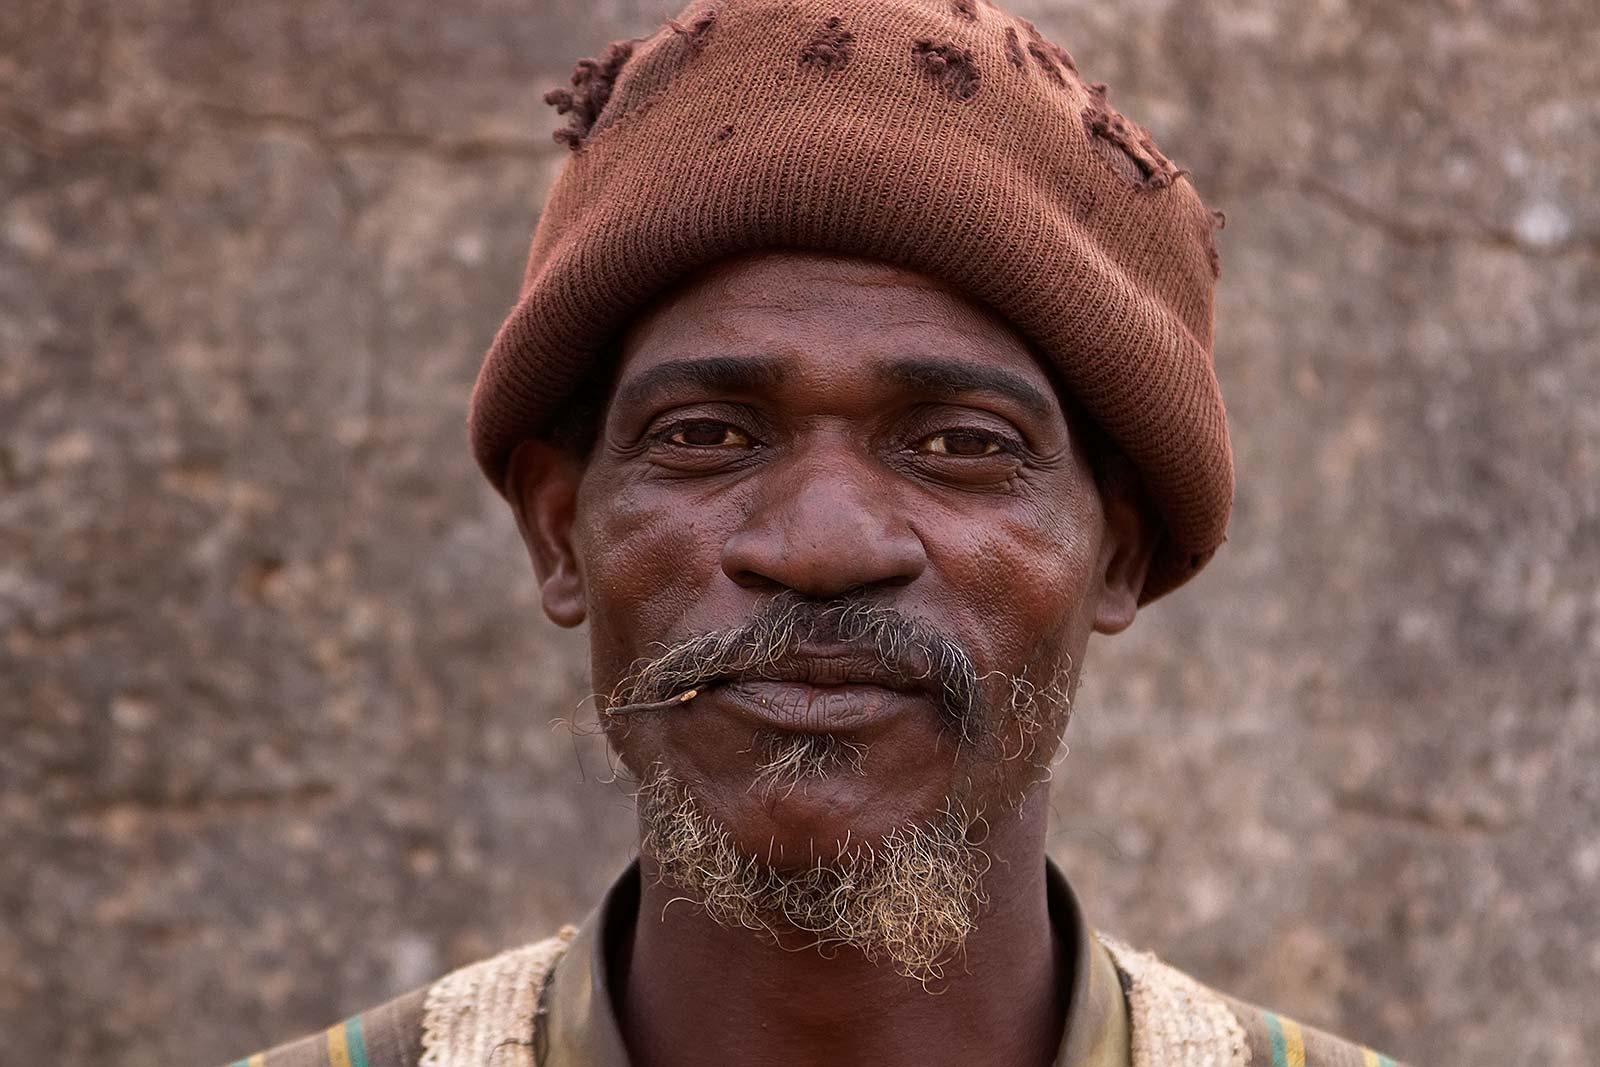 voodoo-doctor-portrait-banfora-burkina-faso-africa-5